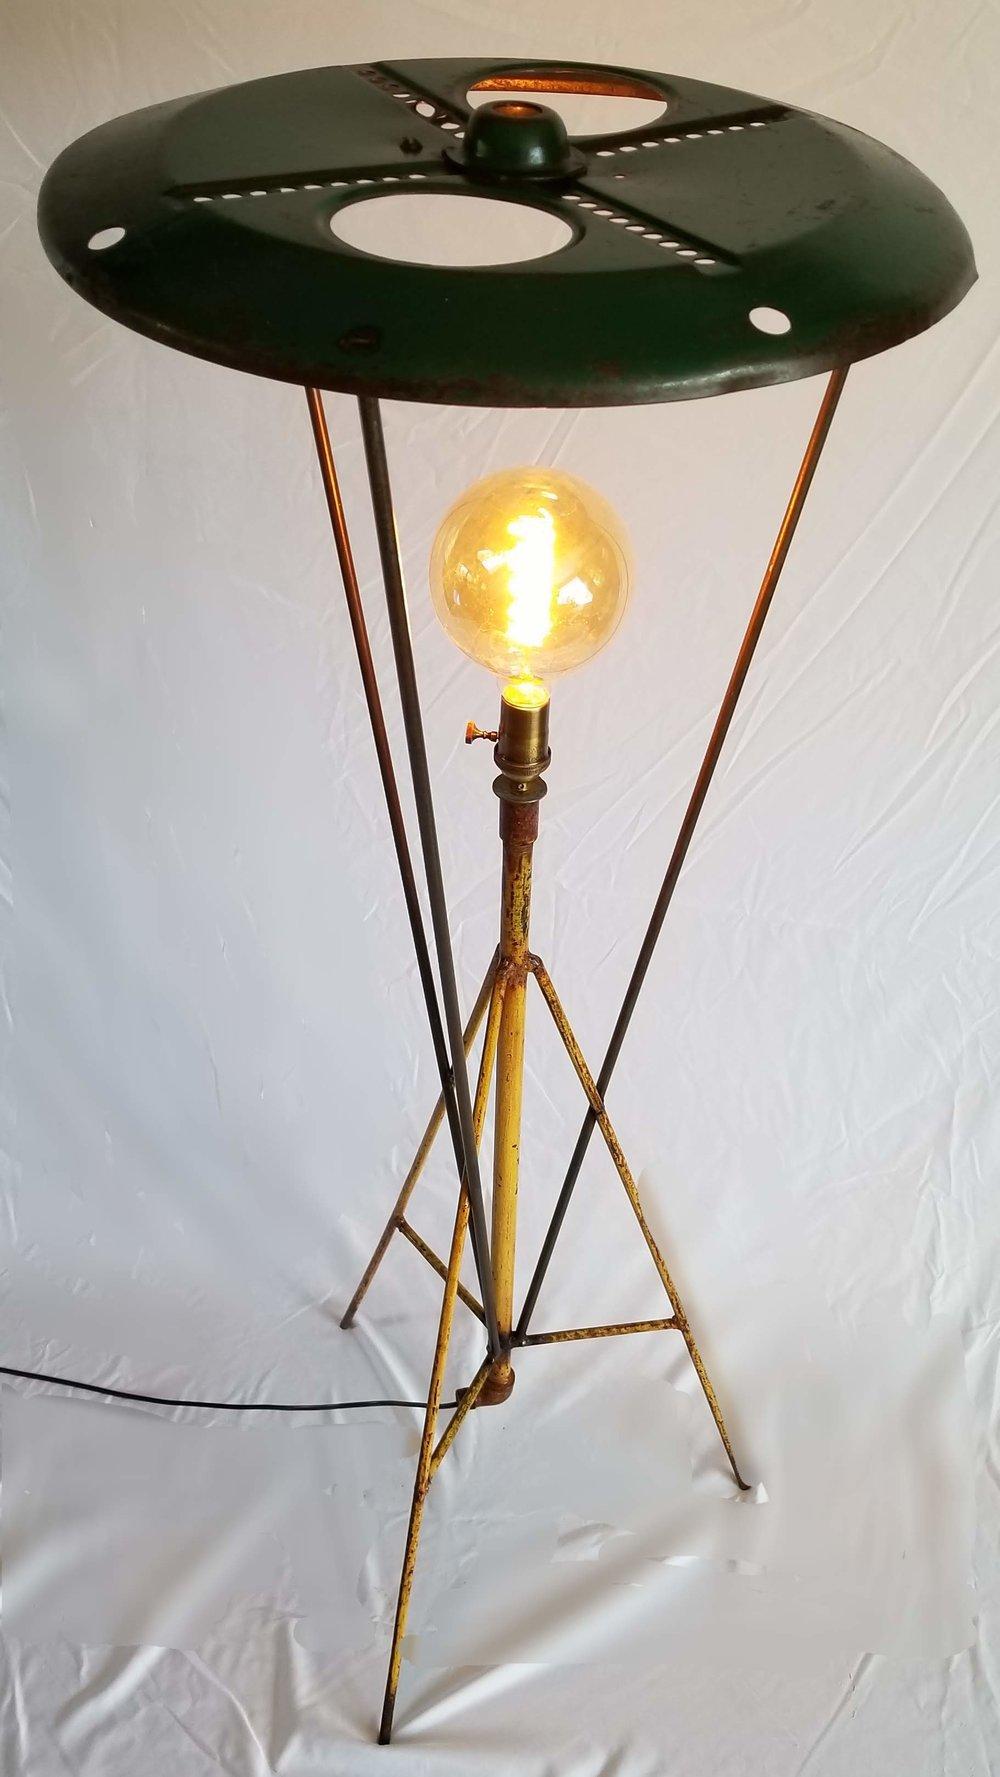 Jetsons' Lamp